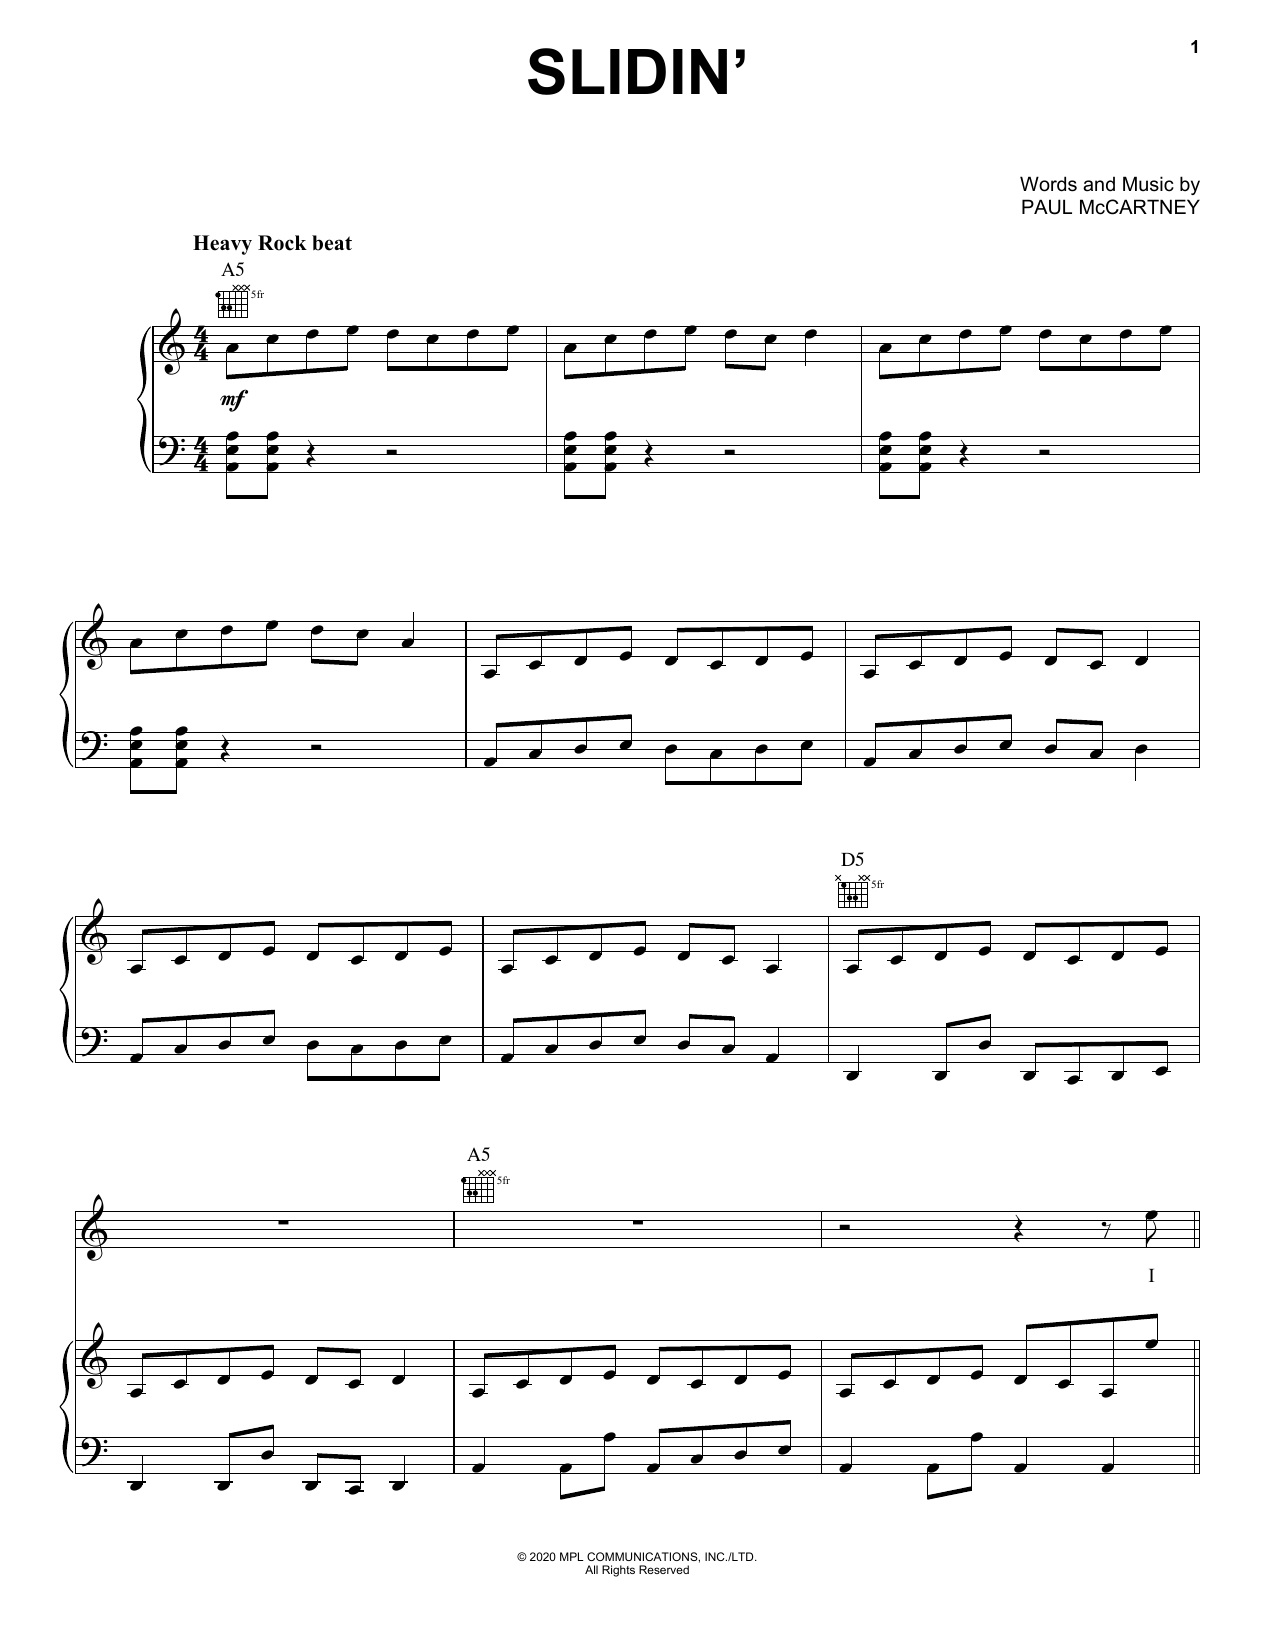 Paul McCartney Slidin' sheet music notes printable PDF score